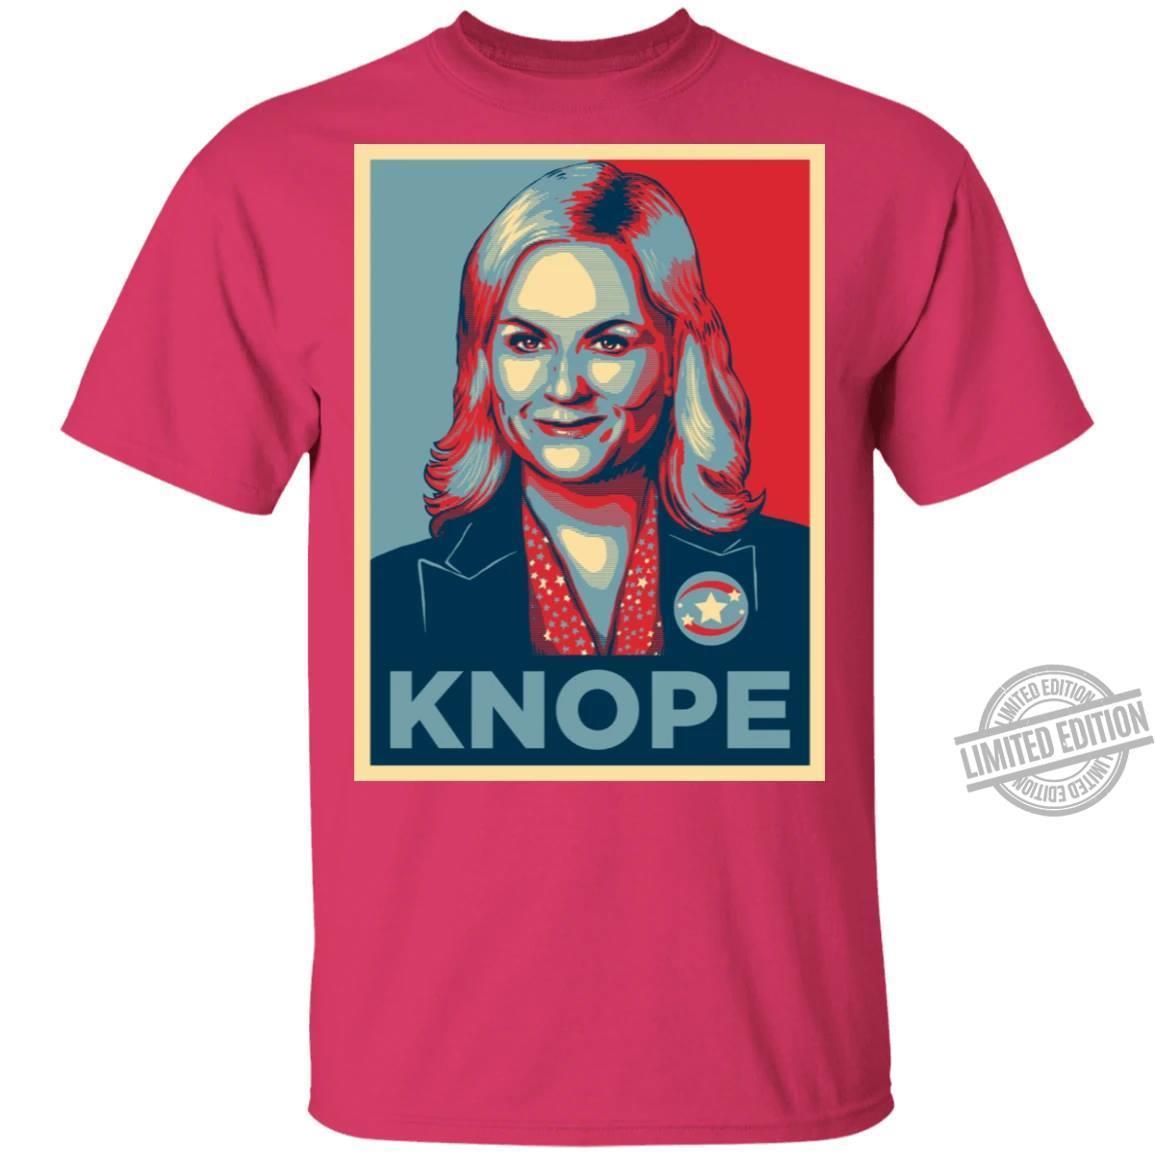 Knope Shirt